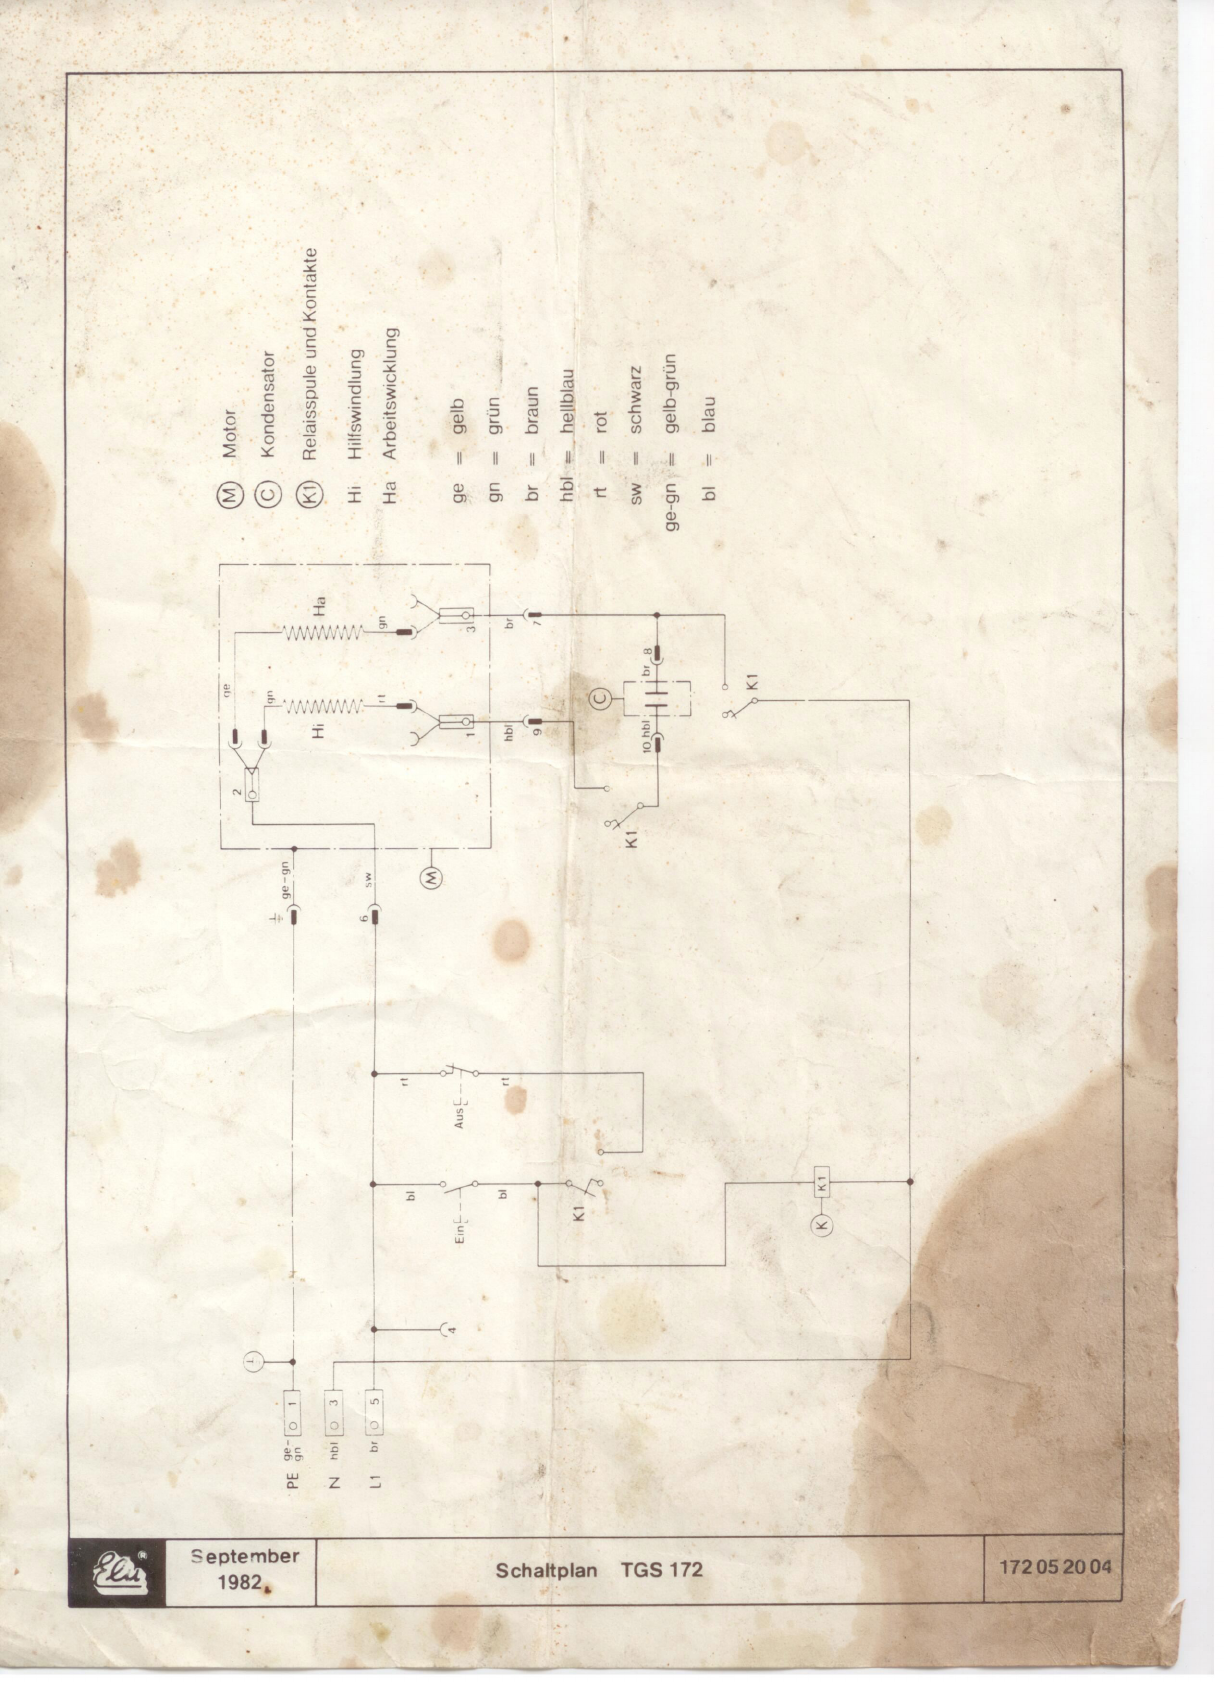 Manual Elu TGS 172 (page 19 of 21) (German, English, French)